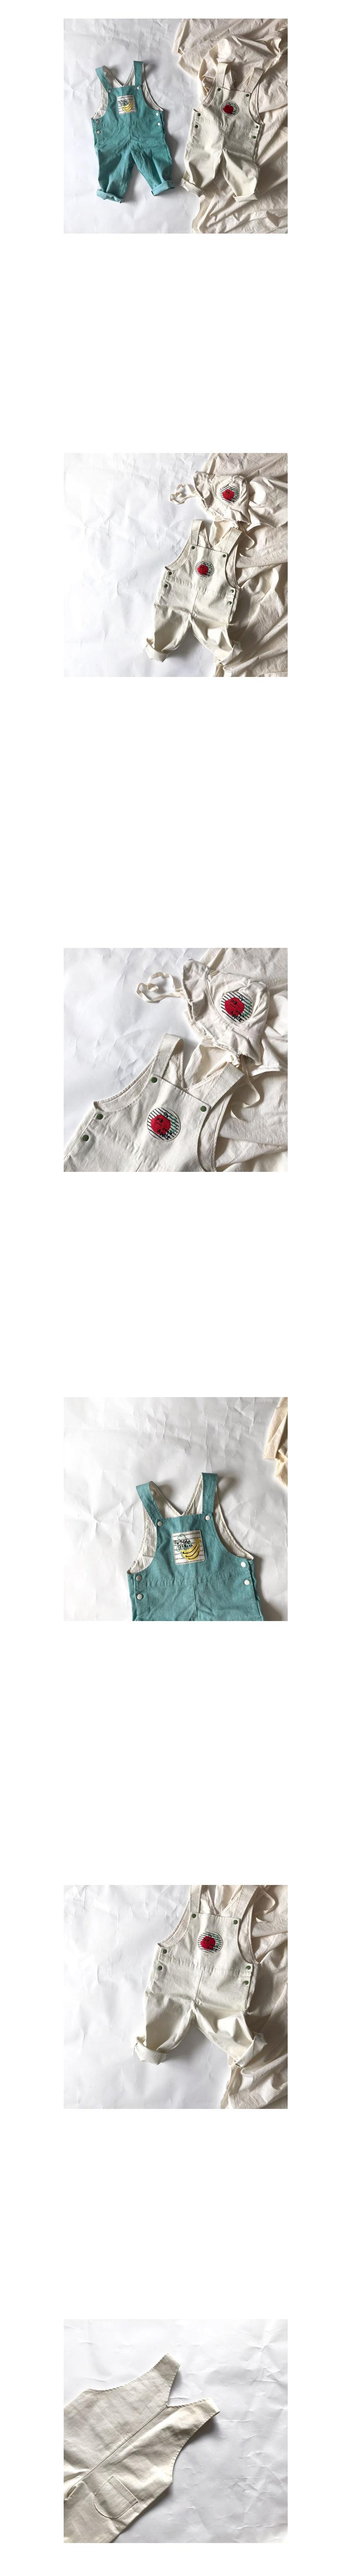 HETZEBEBE - Korean Children Fashion - #Kfashion4kids - Snap Active Dungarees Suspender Pants  - 4